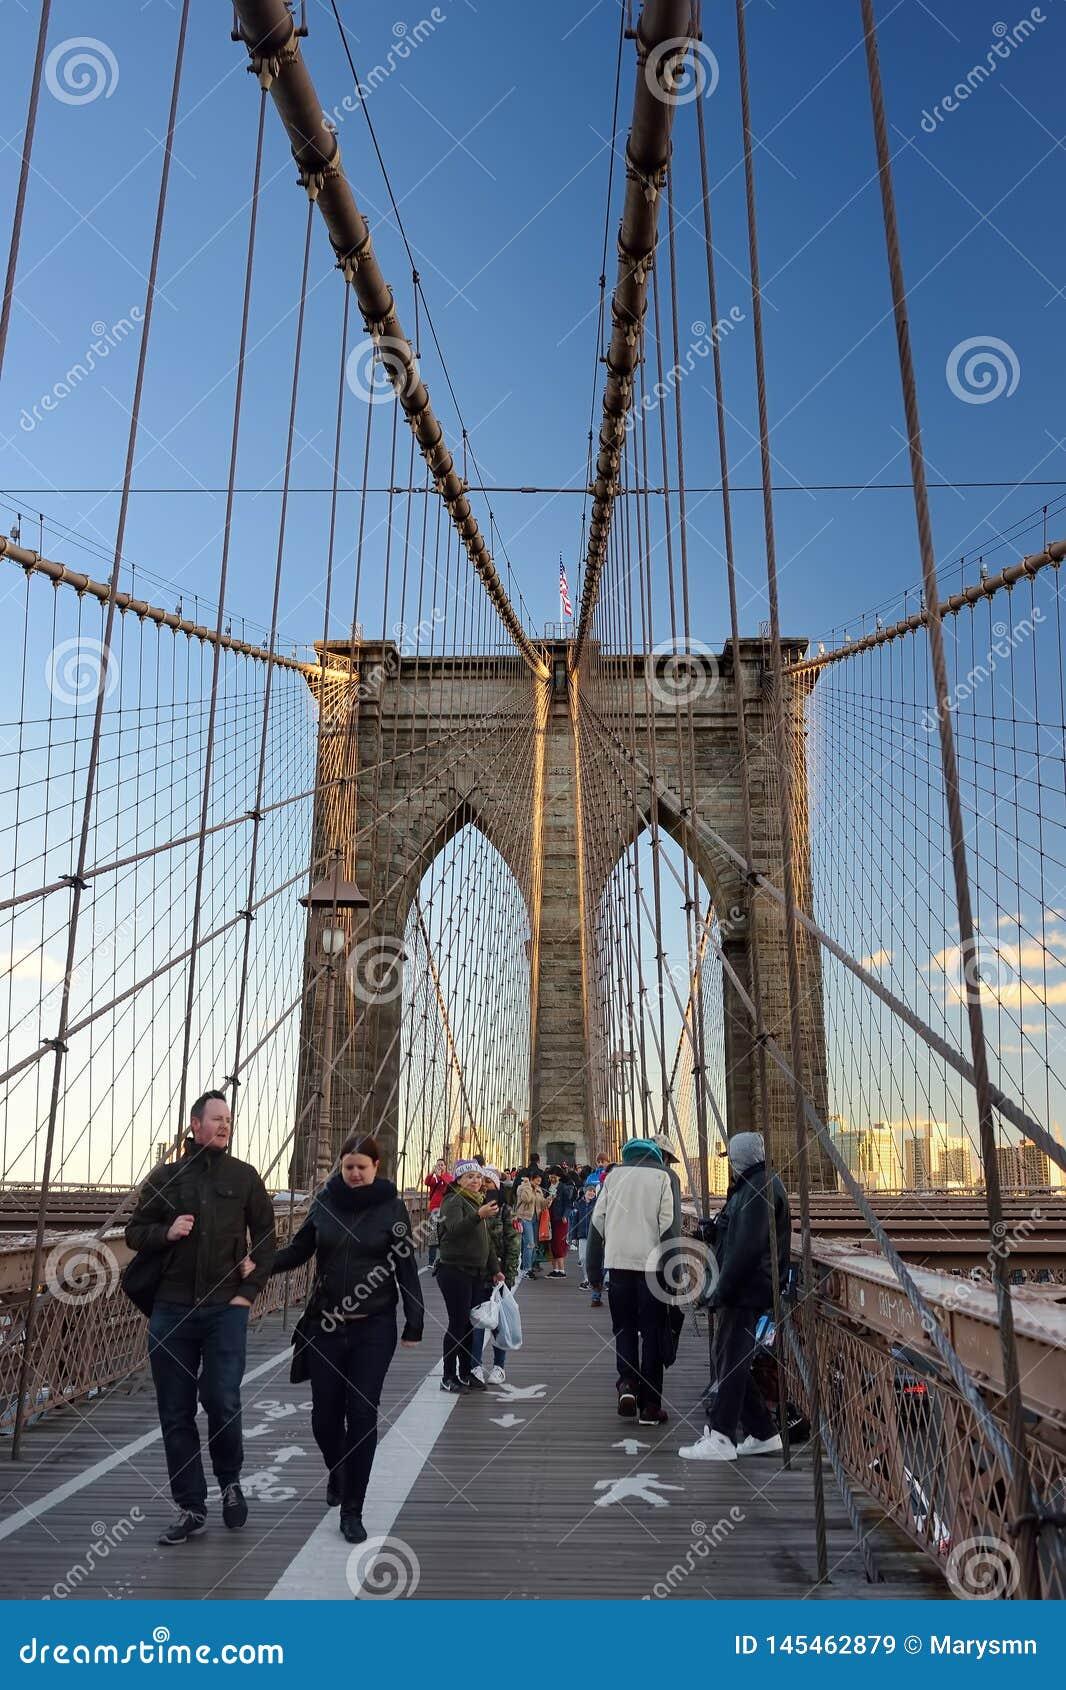 NEW YORK, USA - 21 OCTOBER 2018: Pedestrians walk over the Brooklyn Bridge at sunset. Brooklyn Bridge from New York City to